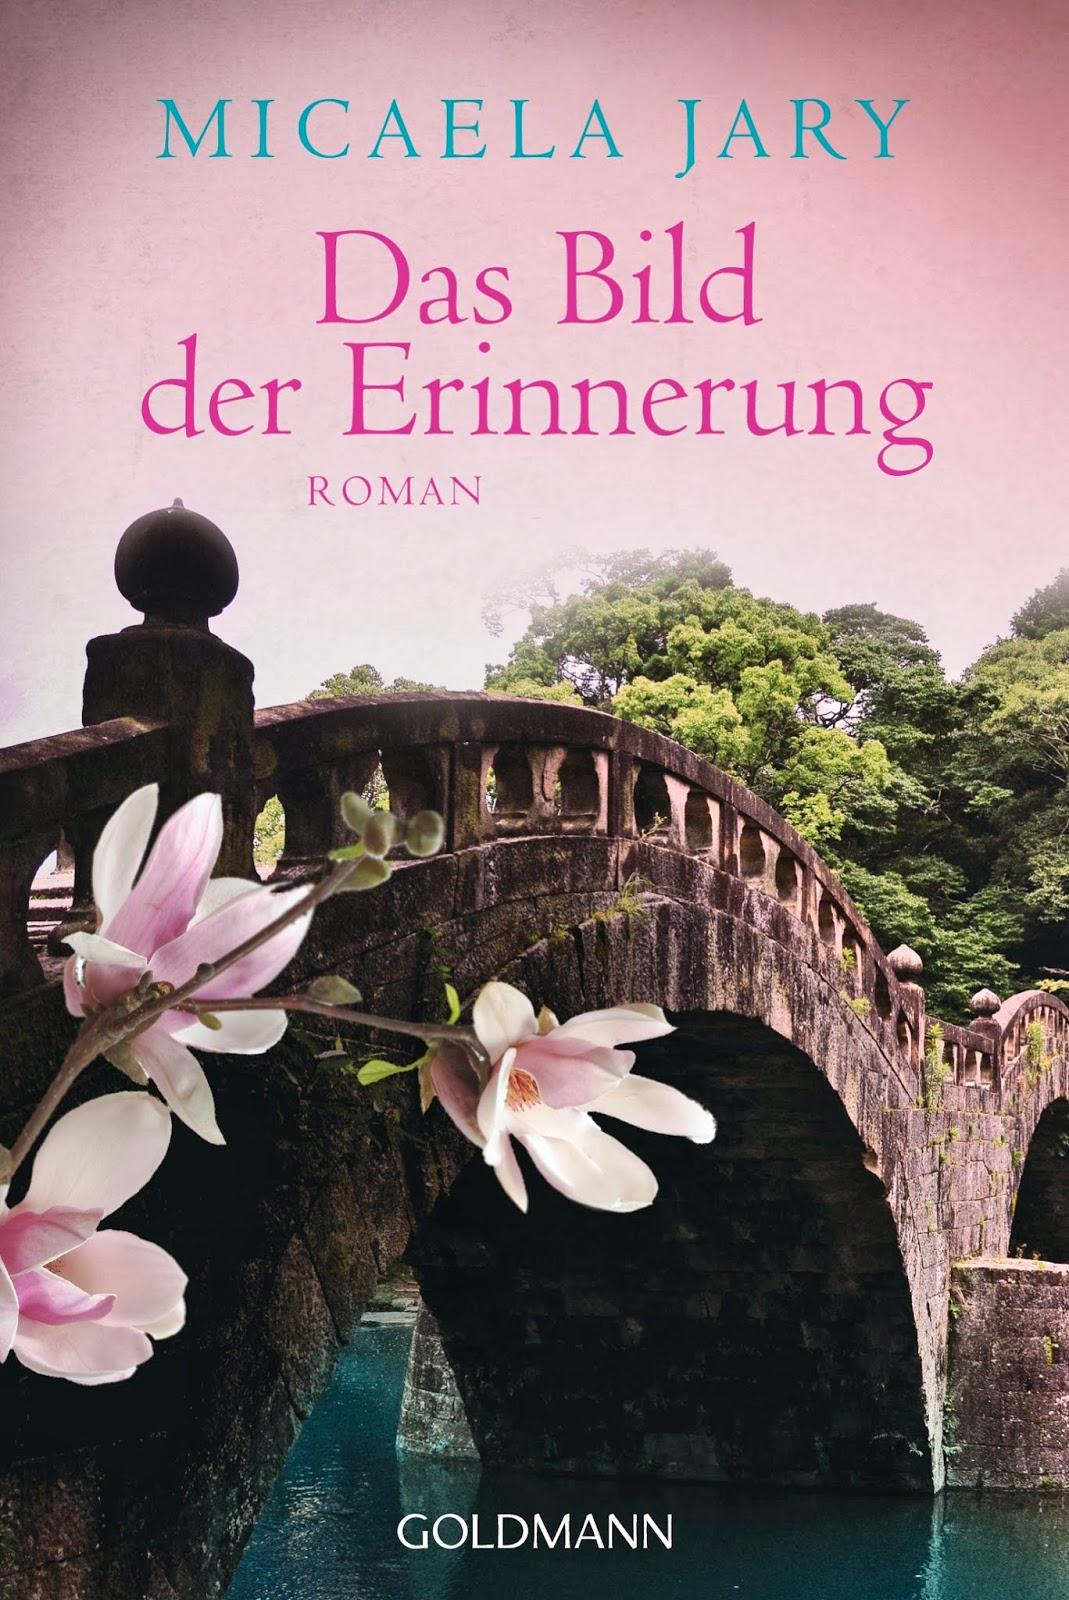 http://www.randomhouse.de/Taschenbuch/Das-Bild-der-Erinnerung-Roman/Micaela-Jary/e406271.rhd